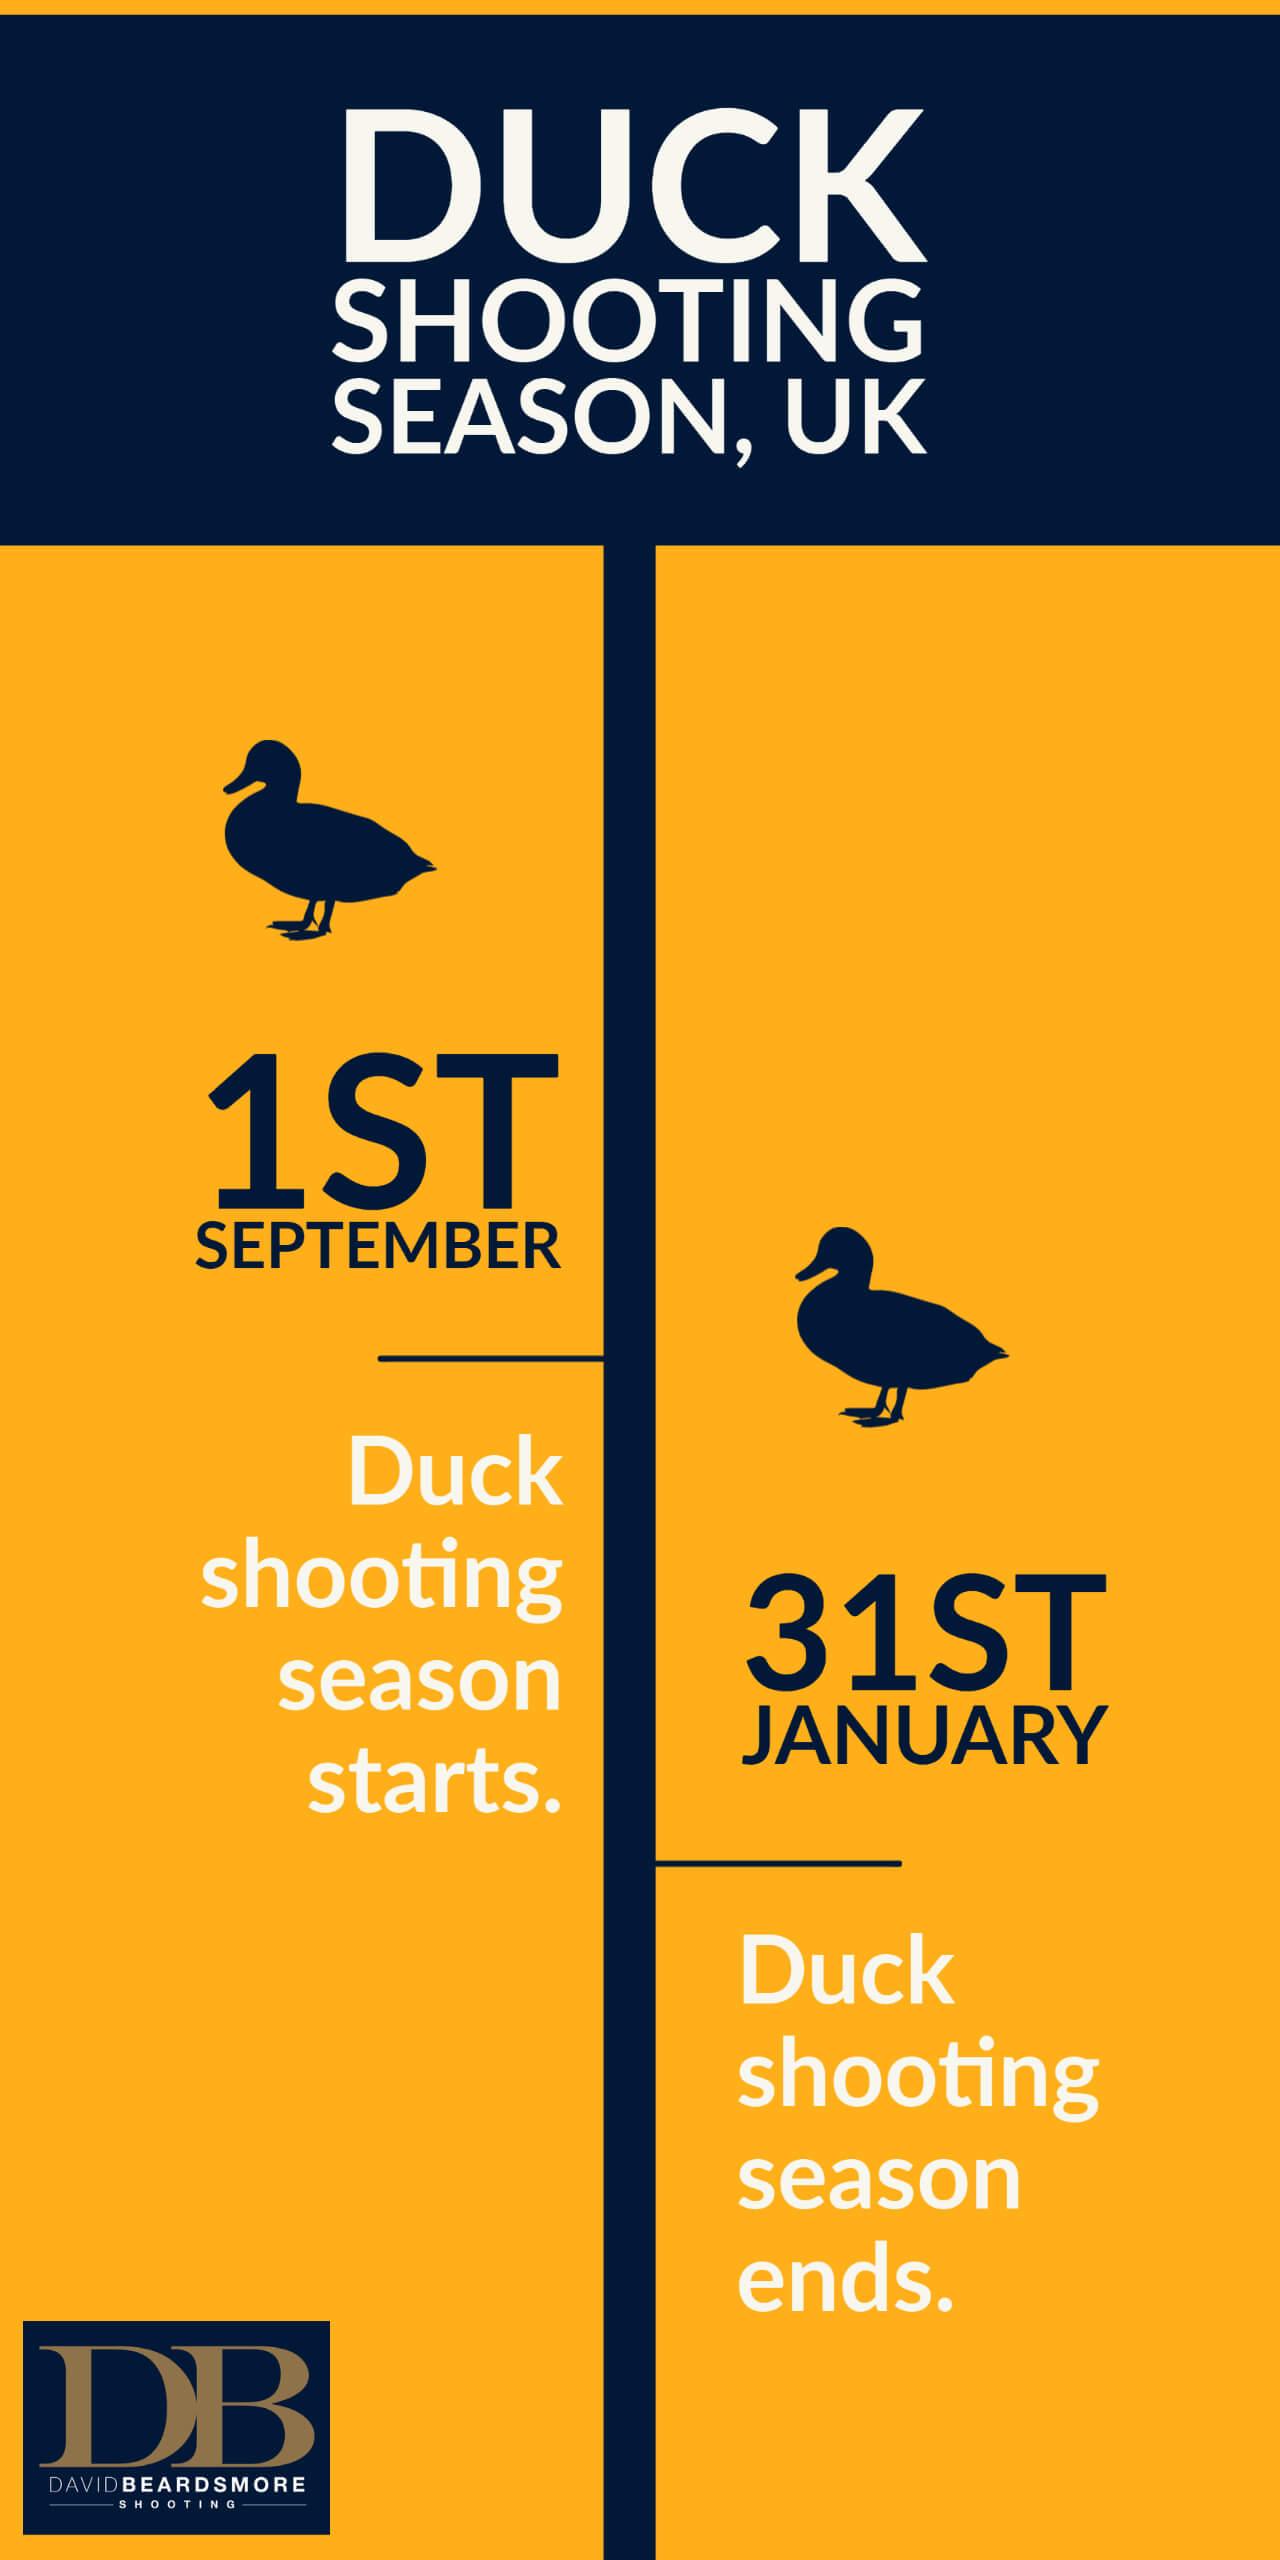 Duck shooting season uk start and ends